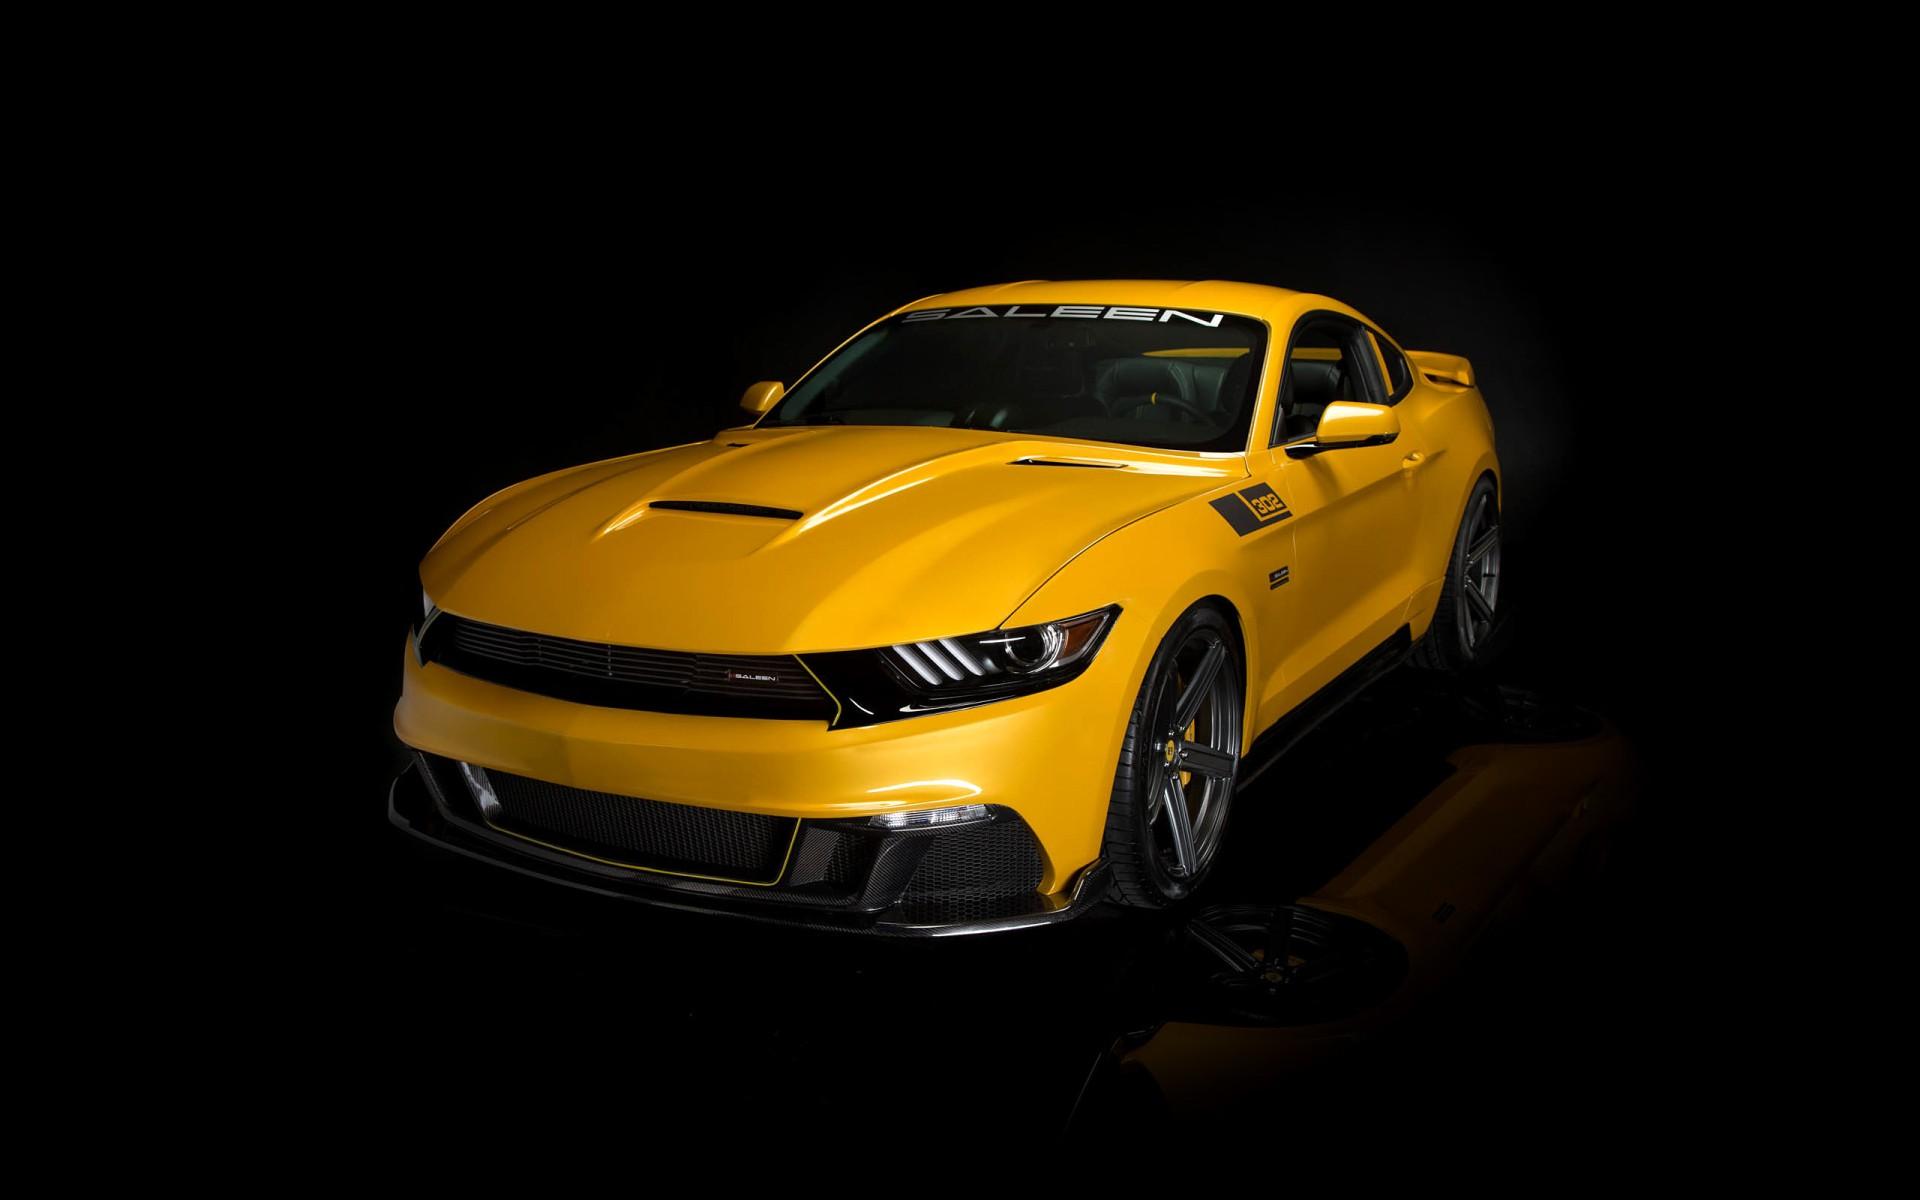 2017 Saleen Mustang >> 2015 Saleen Mustang S302 Black Label Wallpaper | HD Car ...